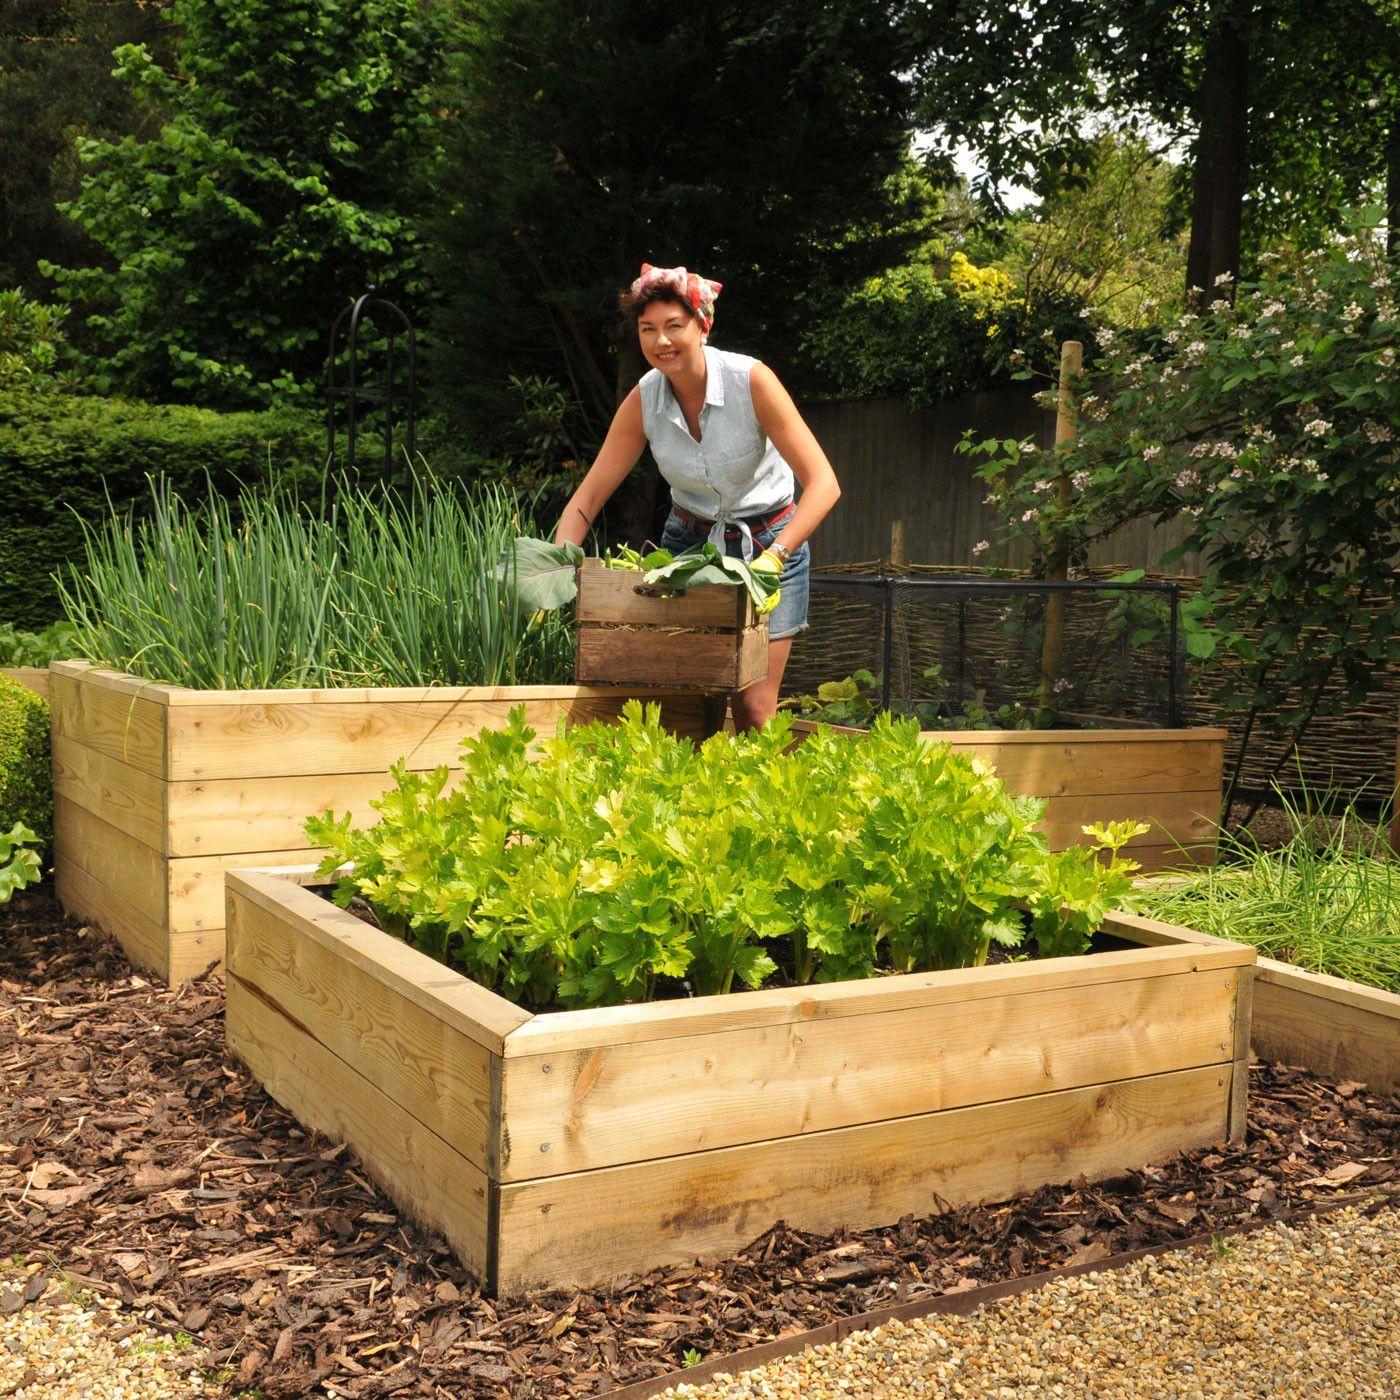 Raised Bed Gardening   Wooden Raised Garden Bed From Harrod Horticultural